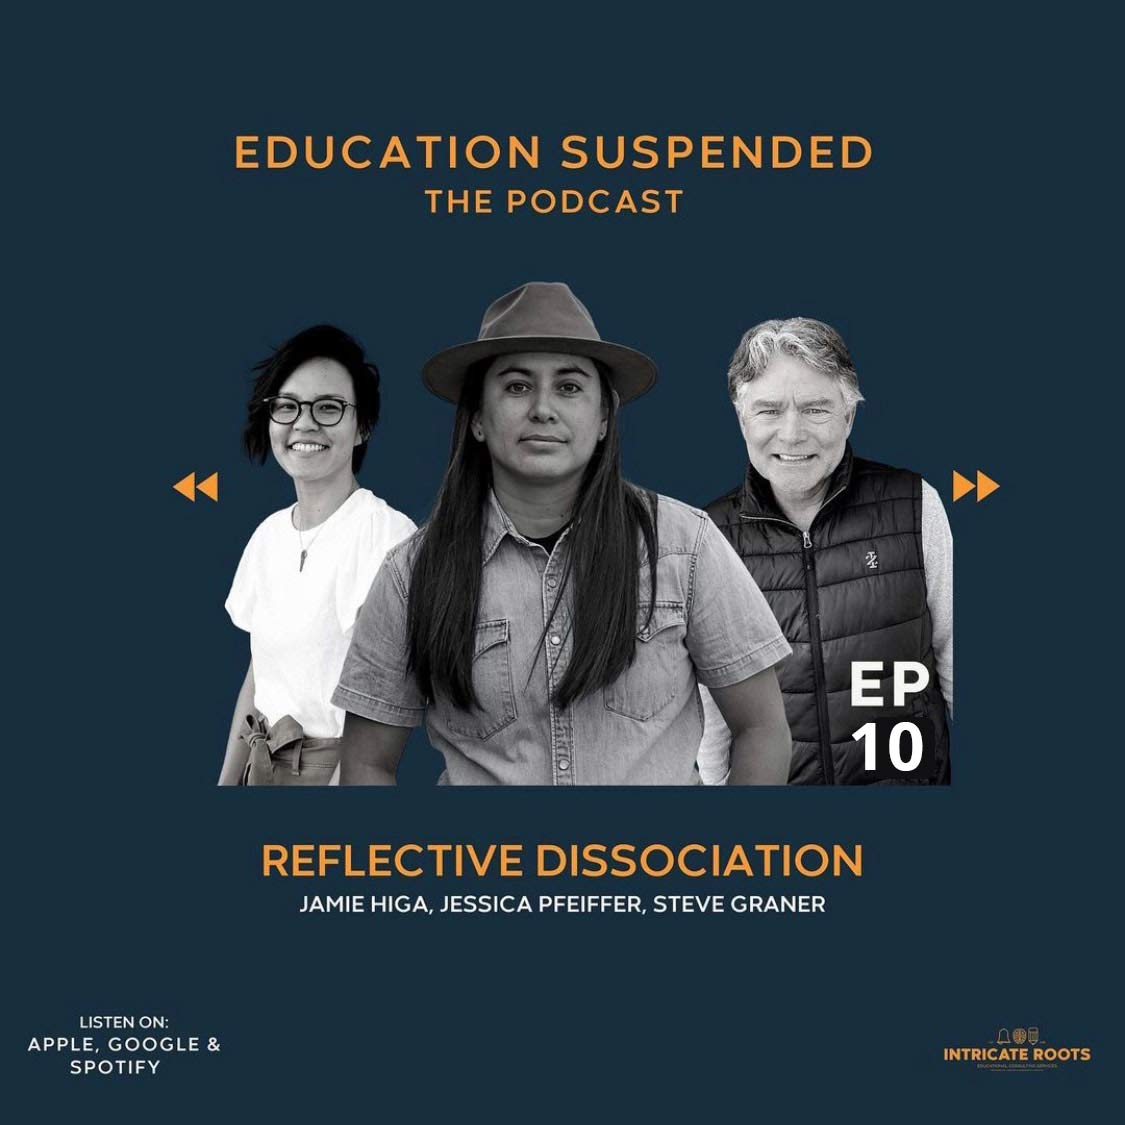 Episode 10: Reflective Dissociation